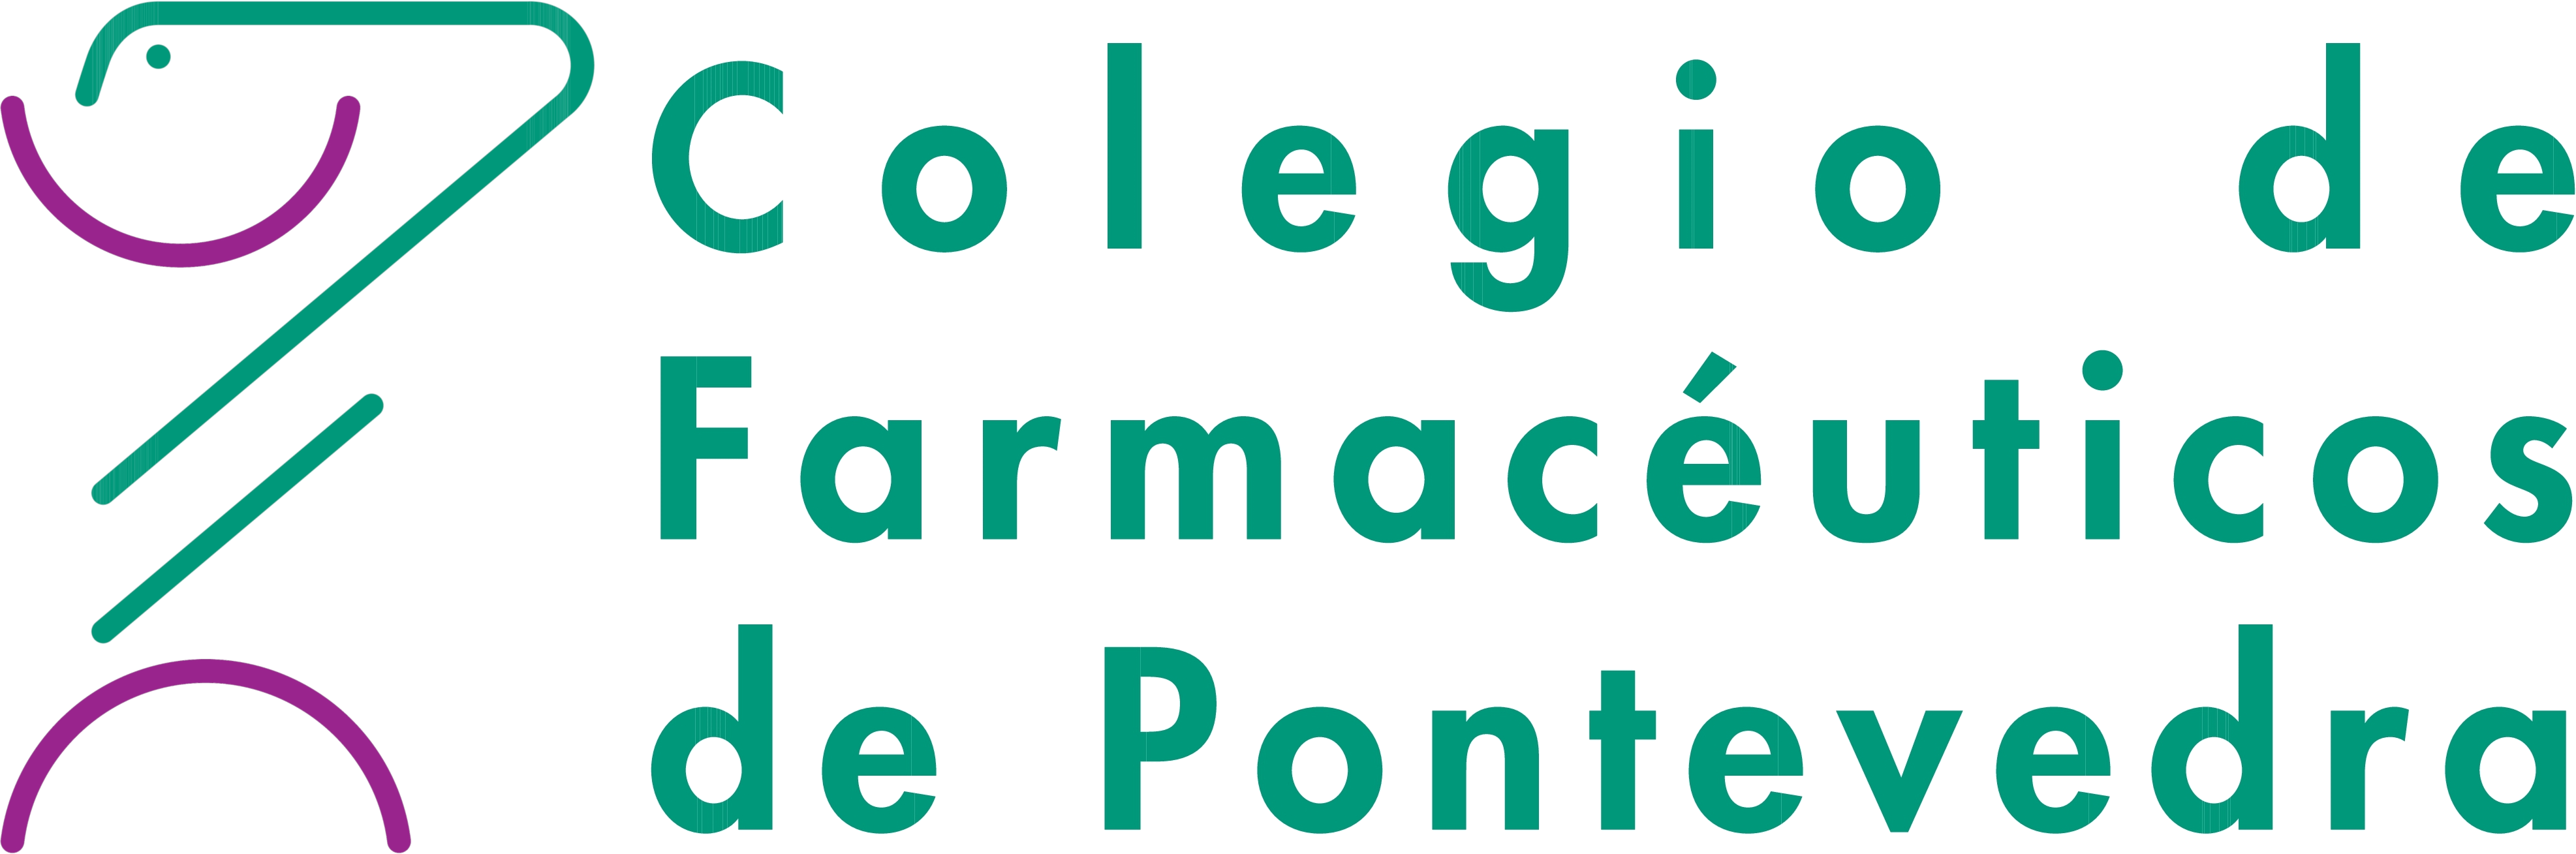 Convocatoria Extraordinaria de titulares de oficina de farmacia